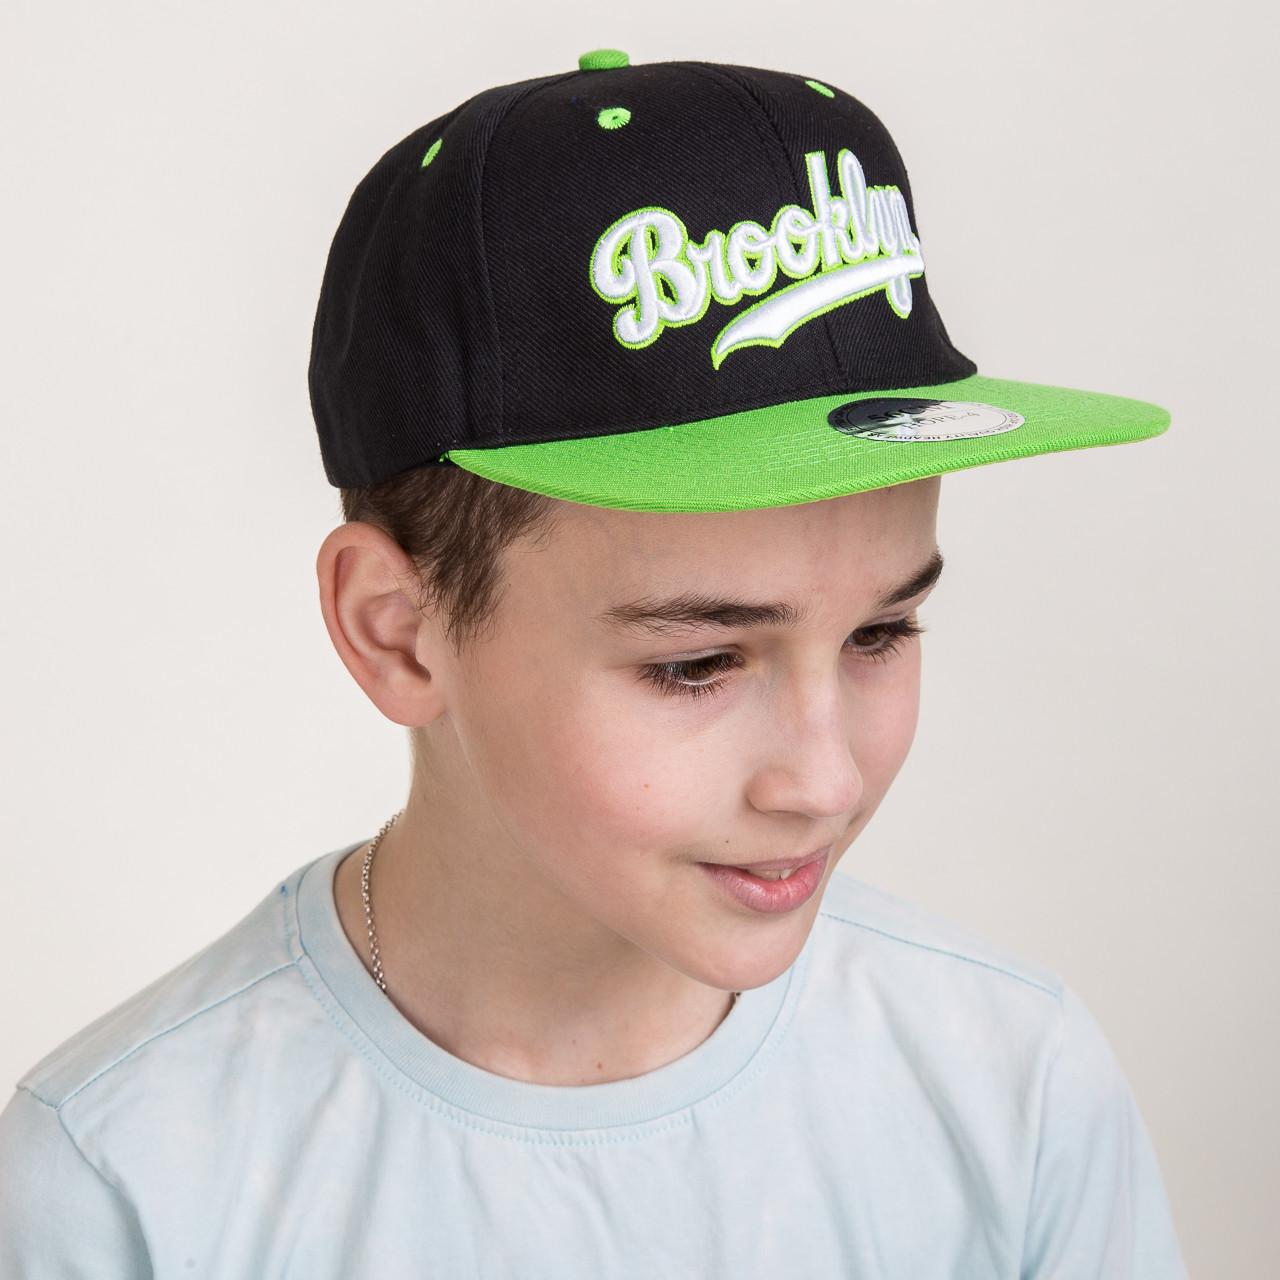 Кепка для мальчика Snapback от производителя - Brooklyn - Б09a 1